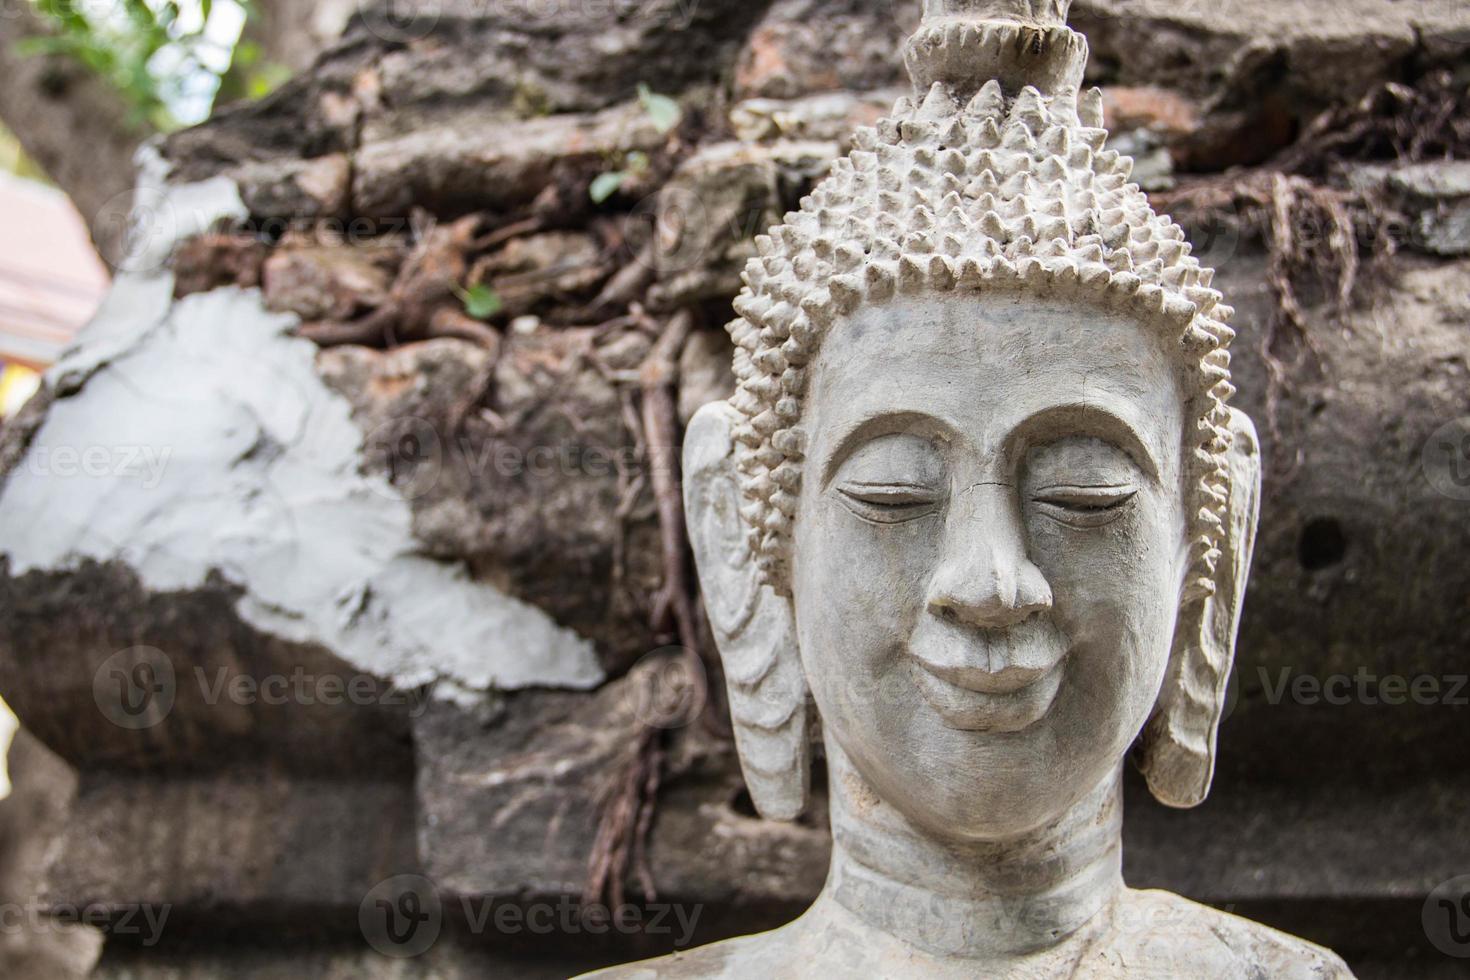 närbild laos stil buddha huvud med grunge bakgrund foto